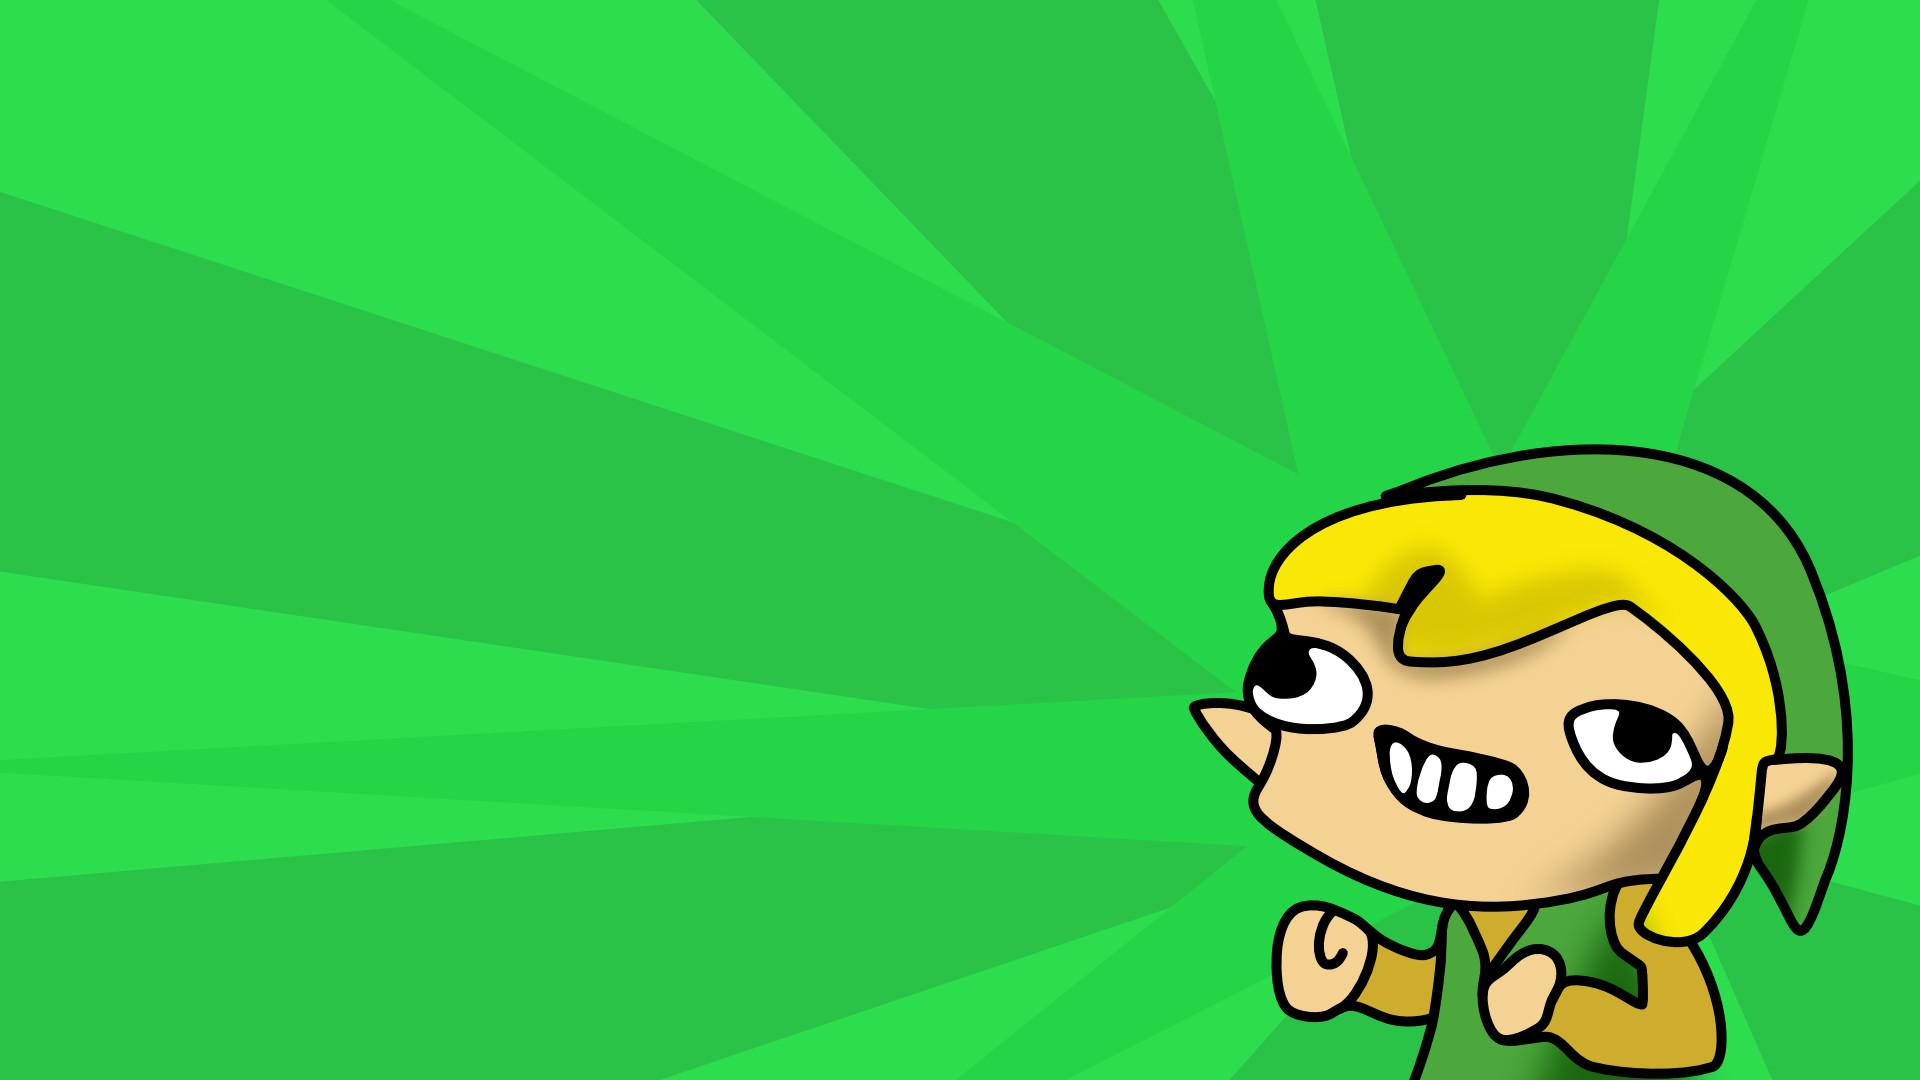 Link Green Meme Wallpaper